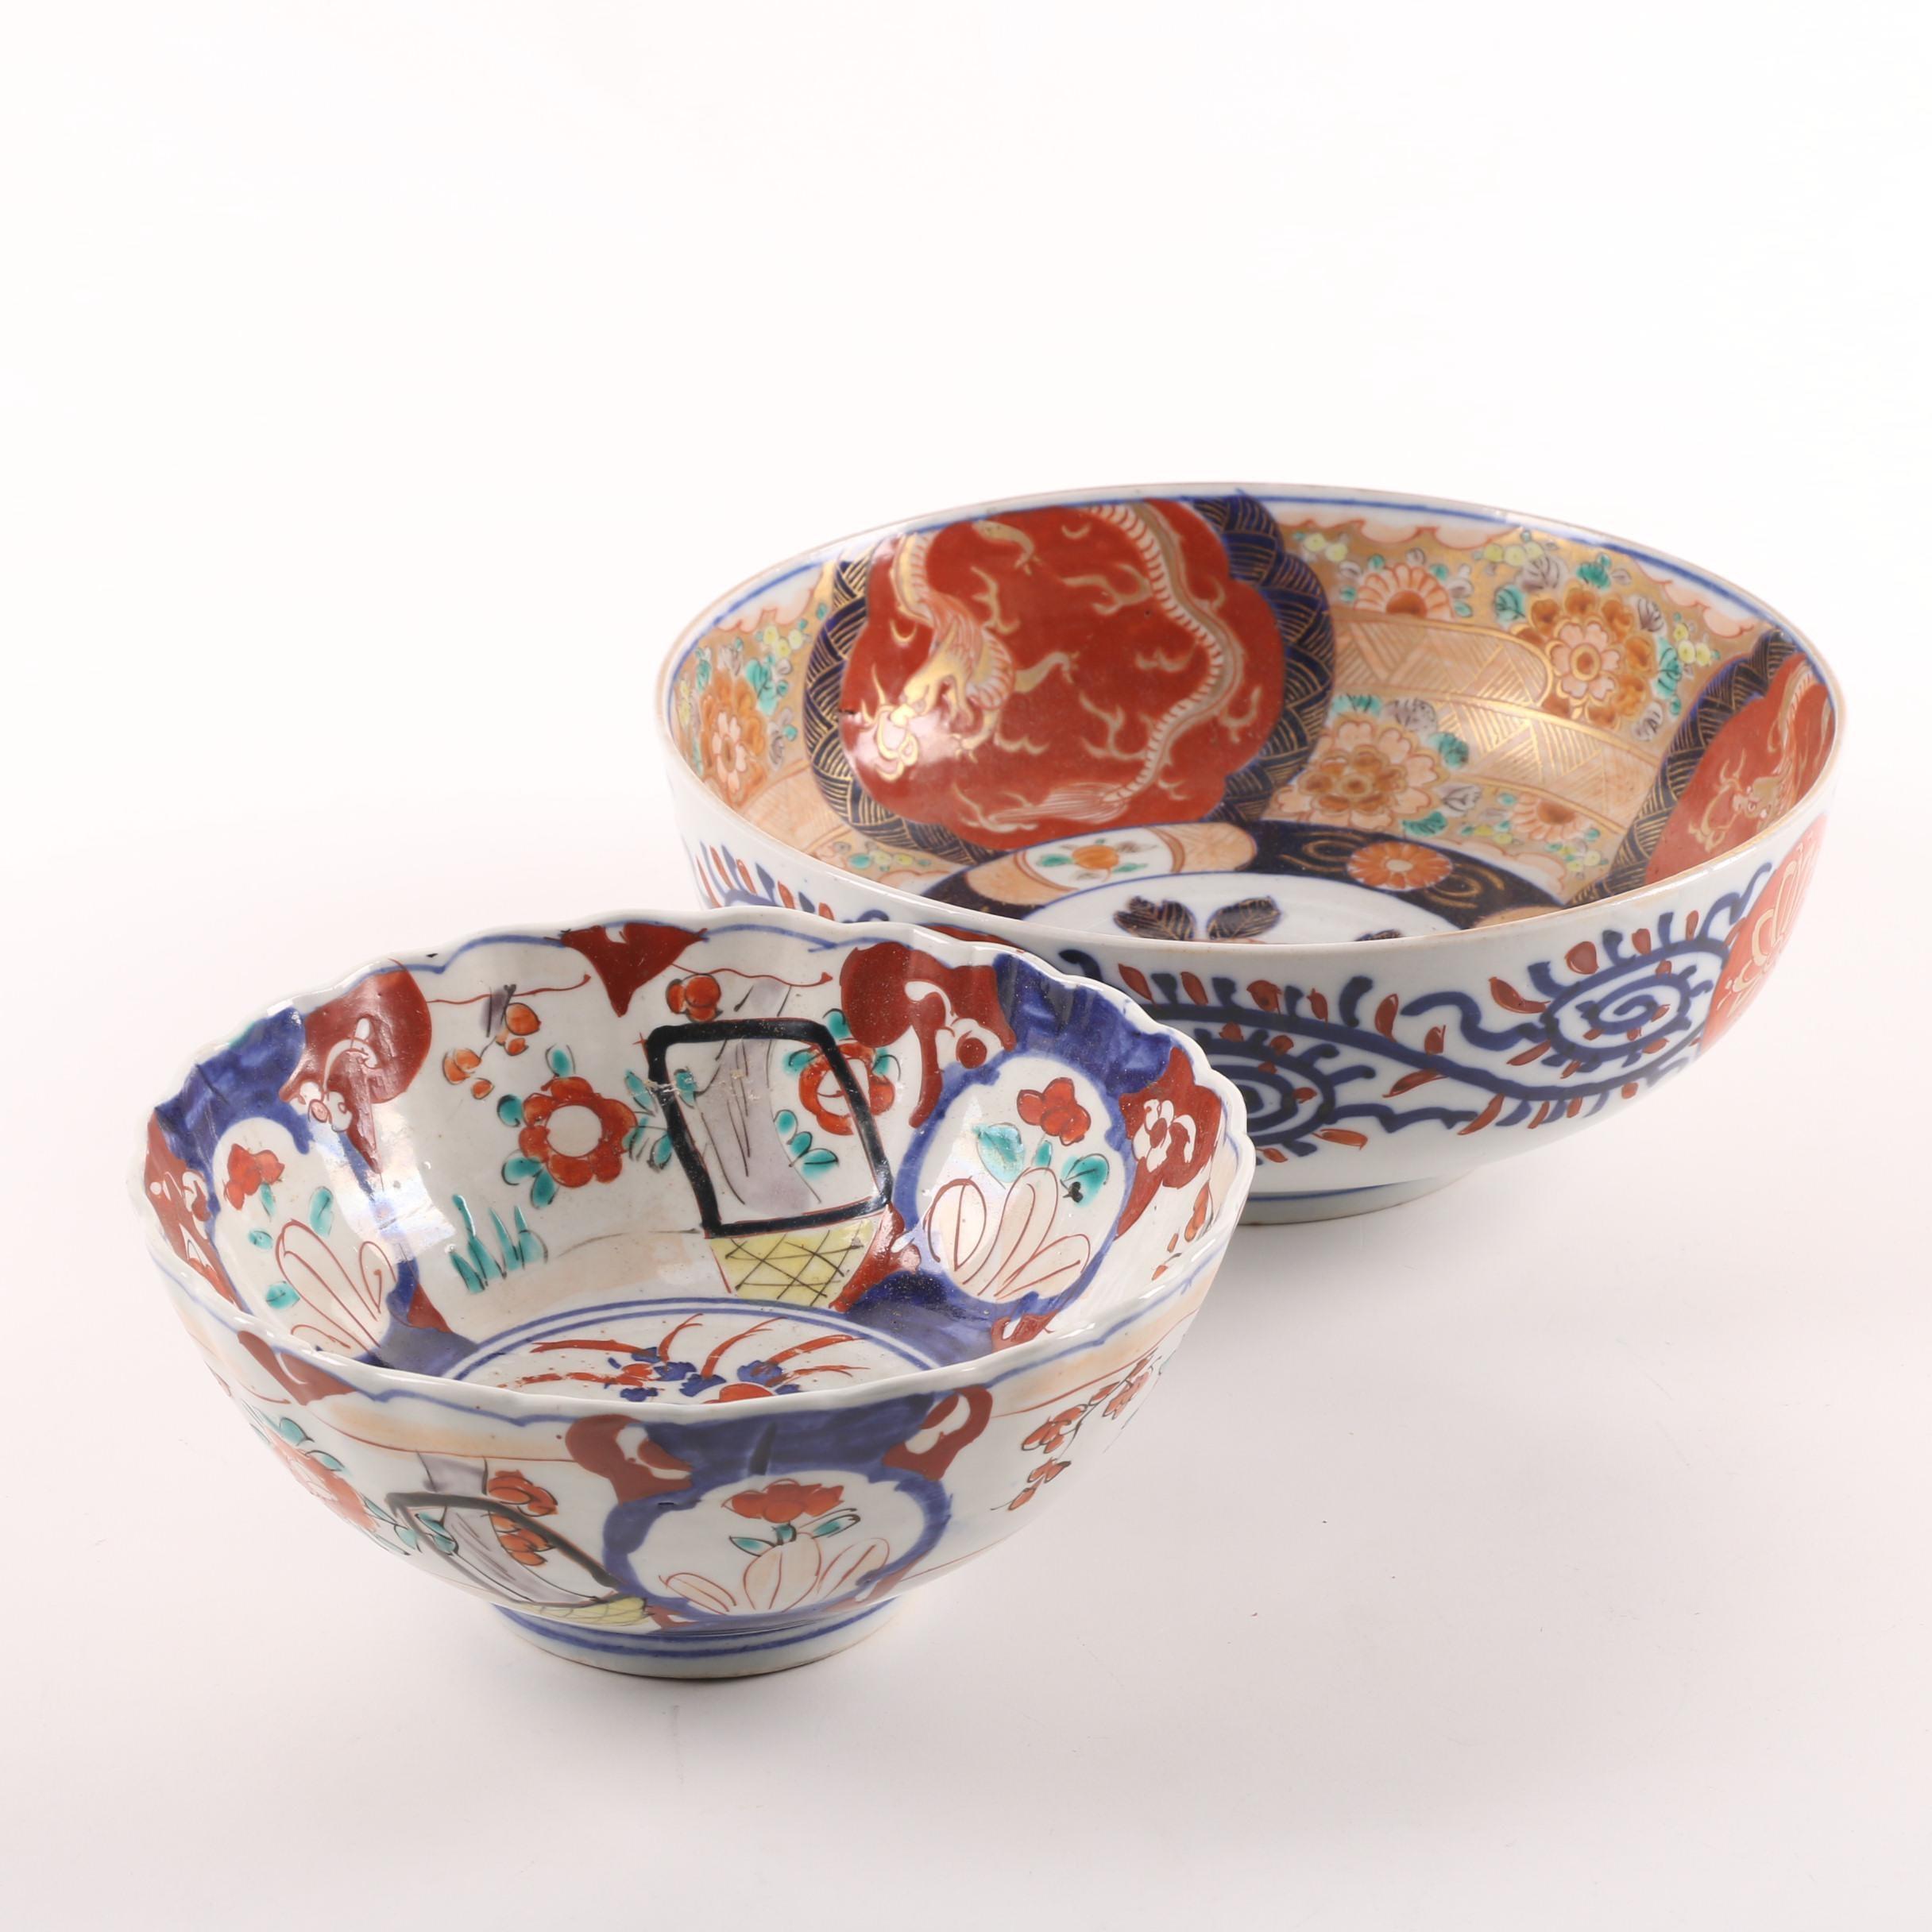 Vintage Japanese Imari Porcelain Bowls